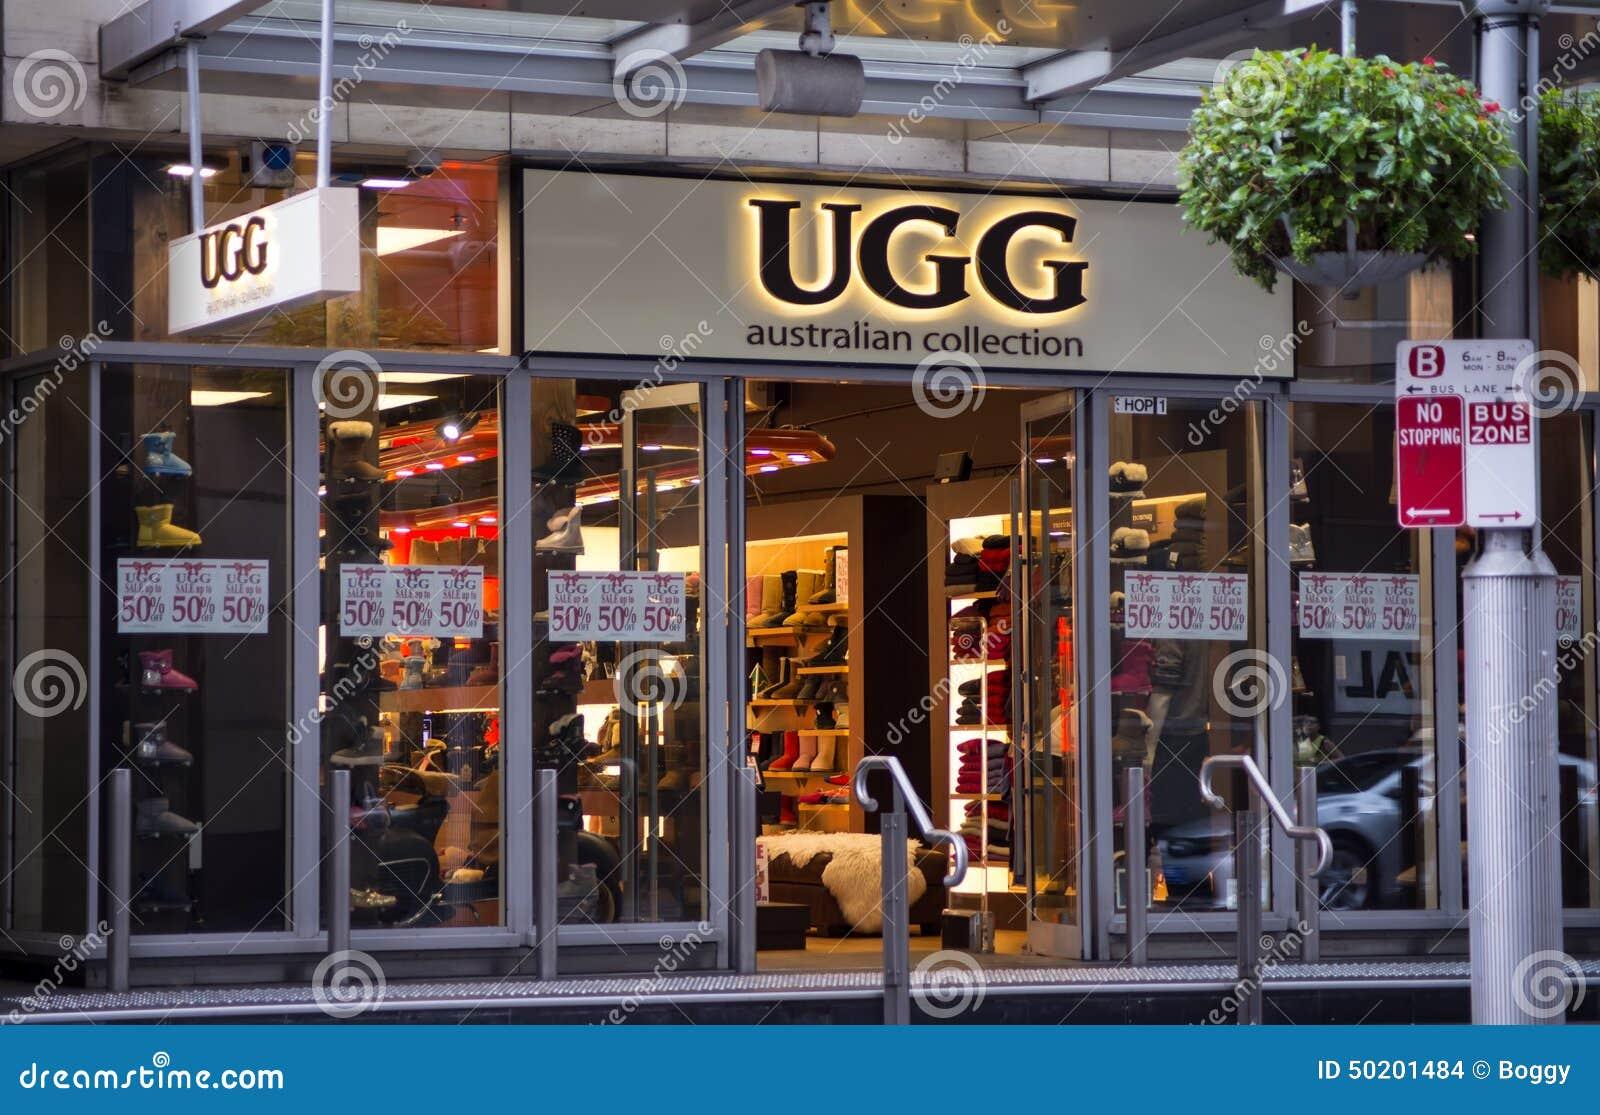 Ugg Boots Las Vegas